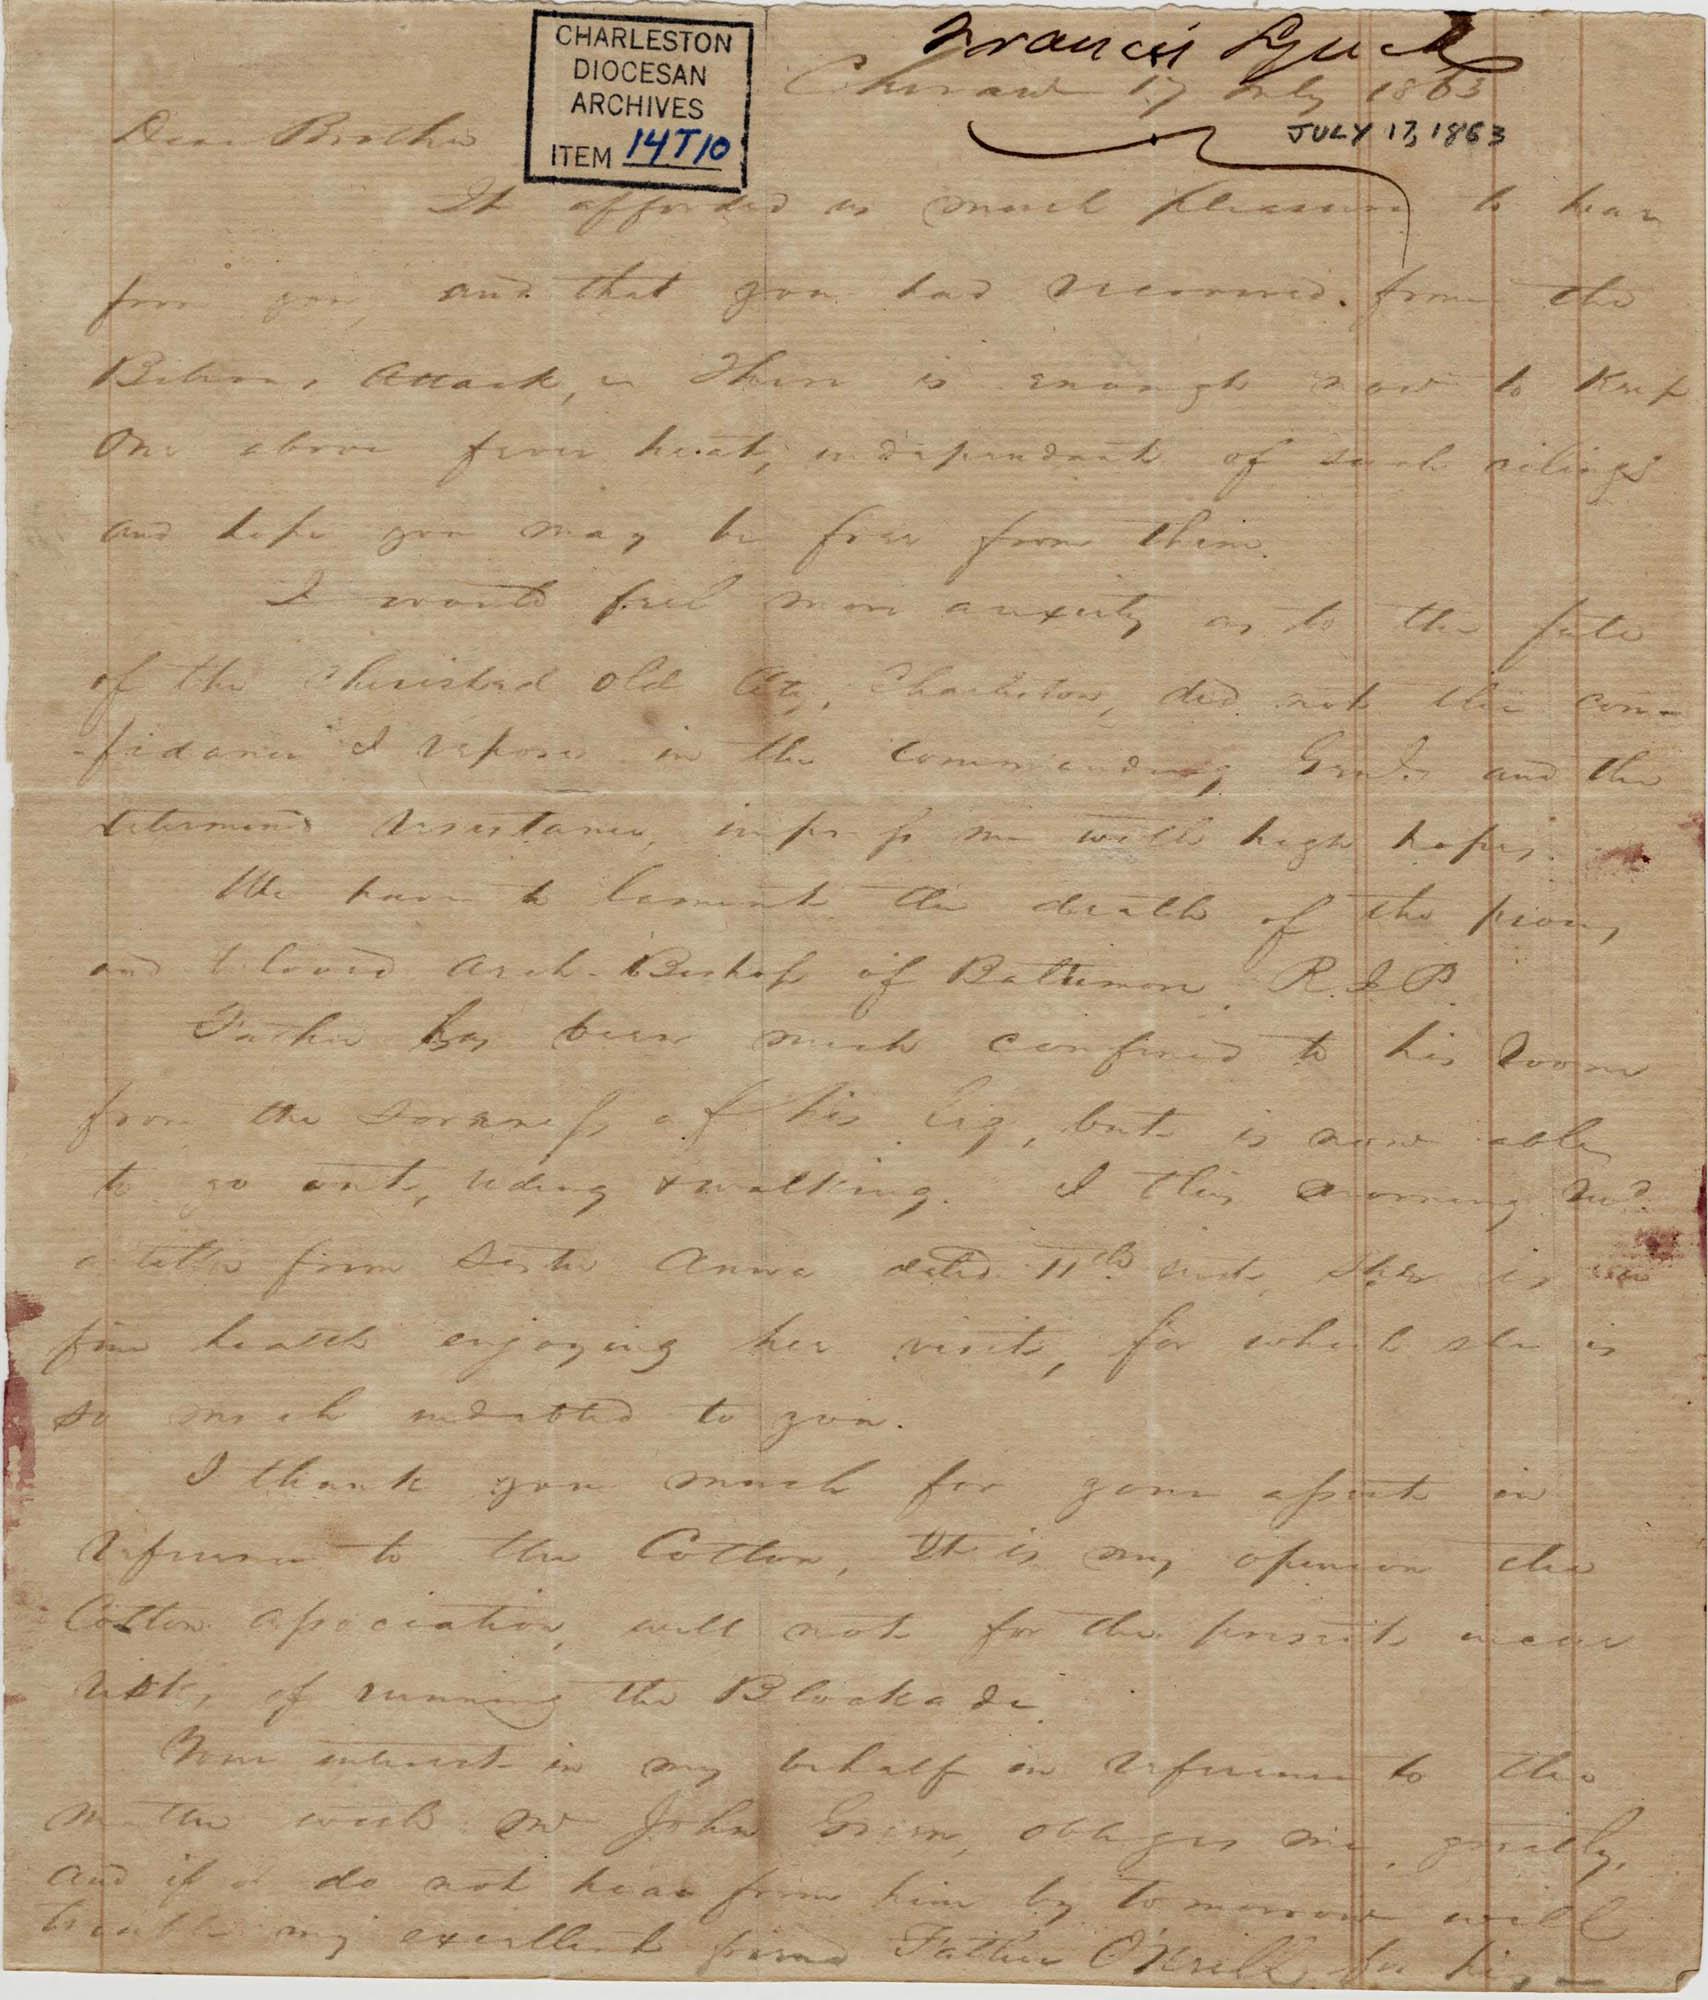 286. Francis Lynch to Bp Patrick Lynch -- July 17, 1863